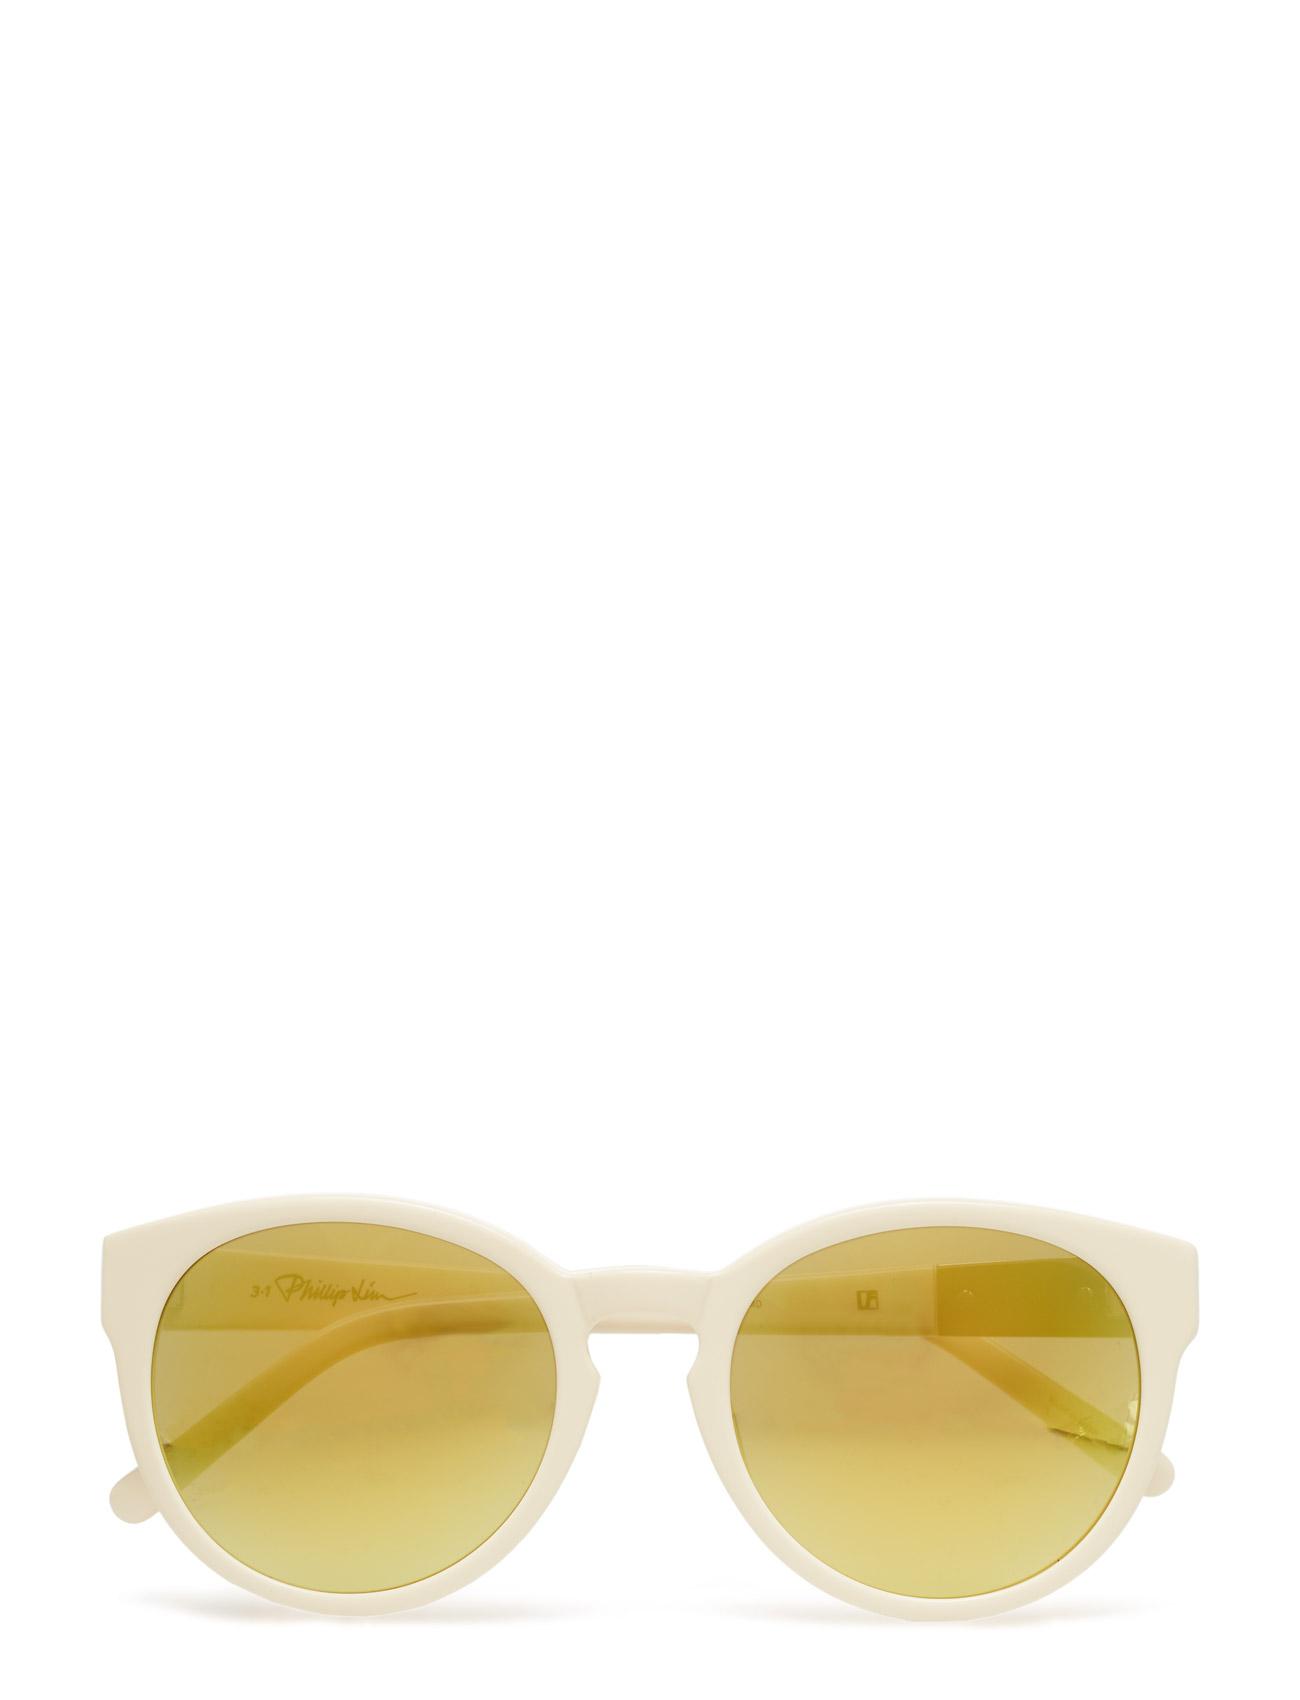 Phillip Lim 130 C5 3.1 Phillip Lim Sunglasses Solbriller til Damer i